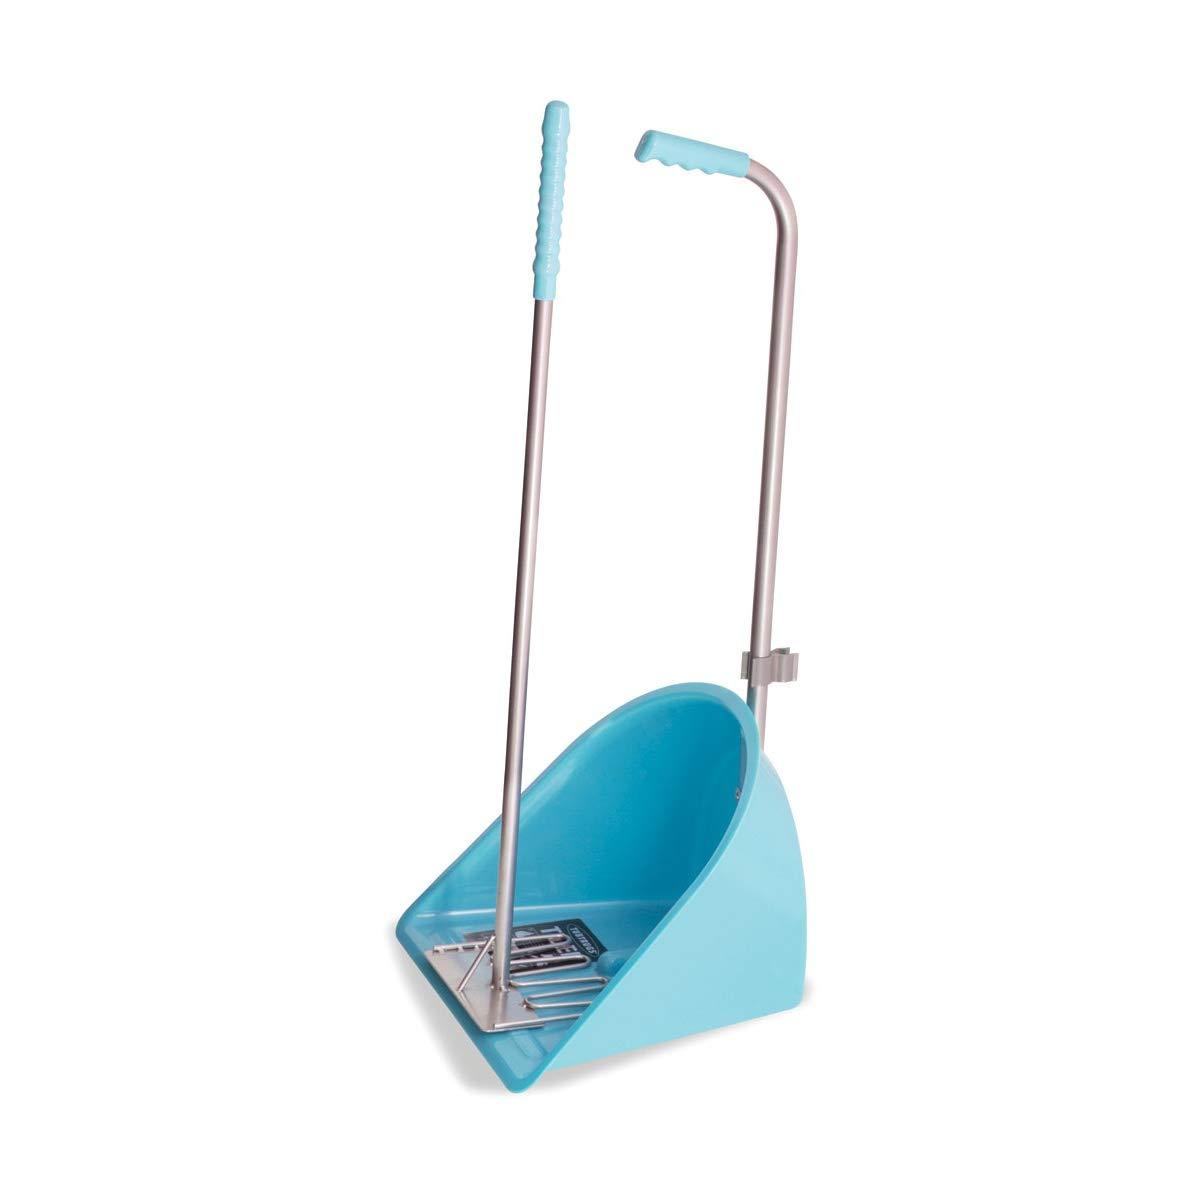 Tub Trug Tidee Manure Scoop : Sky Blue by Faulks & Company